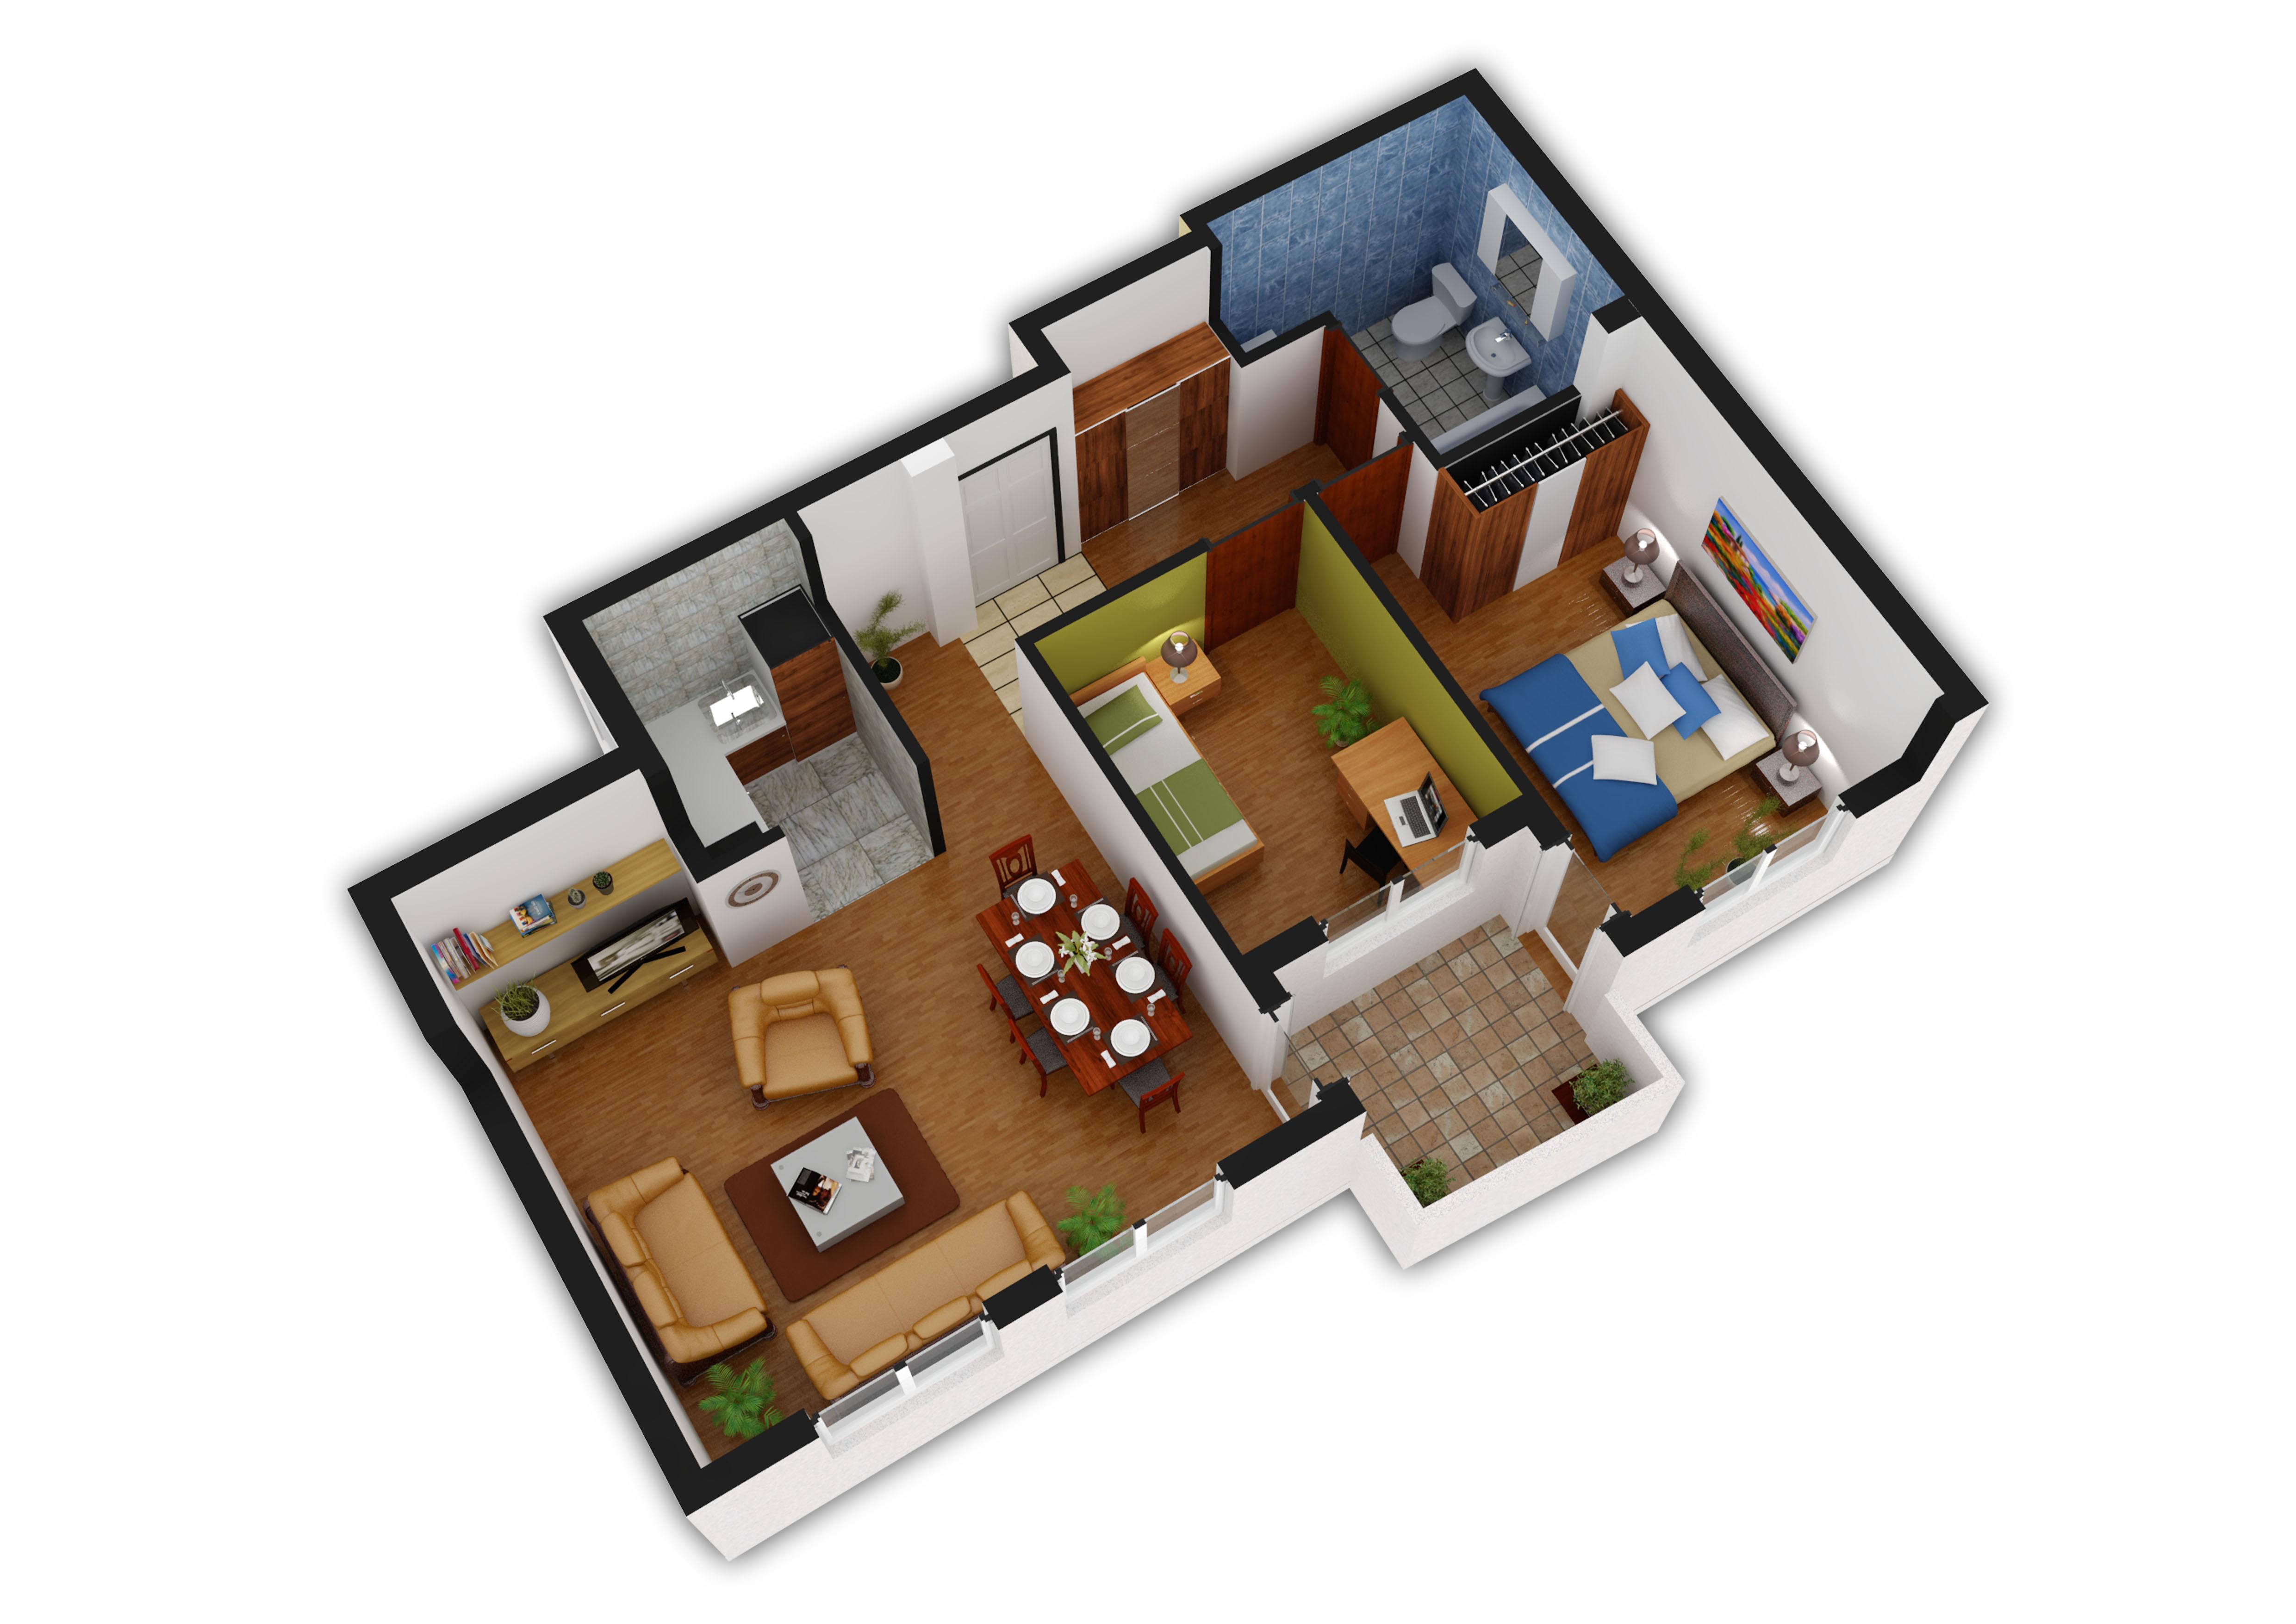 banovo brdo vase staji a 5 66m2 trosoban gramax. Black Bedroom Furniture Sets. Home Design Ideas